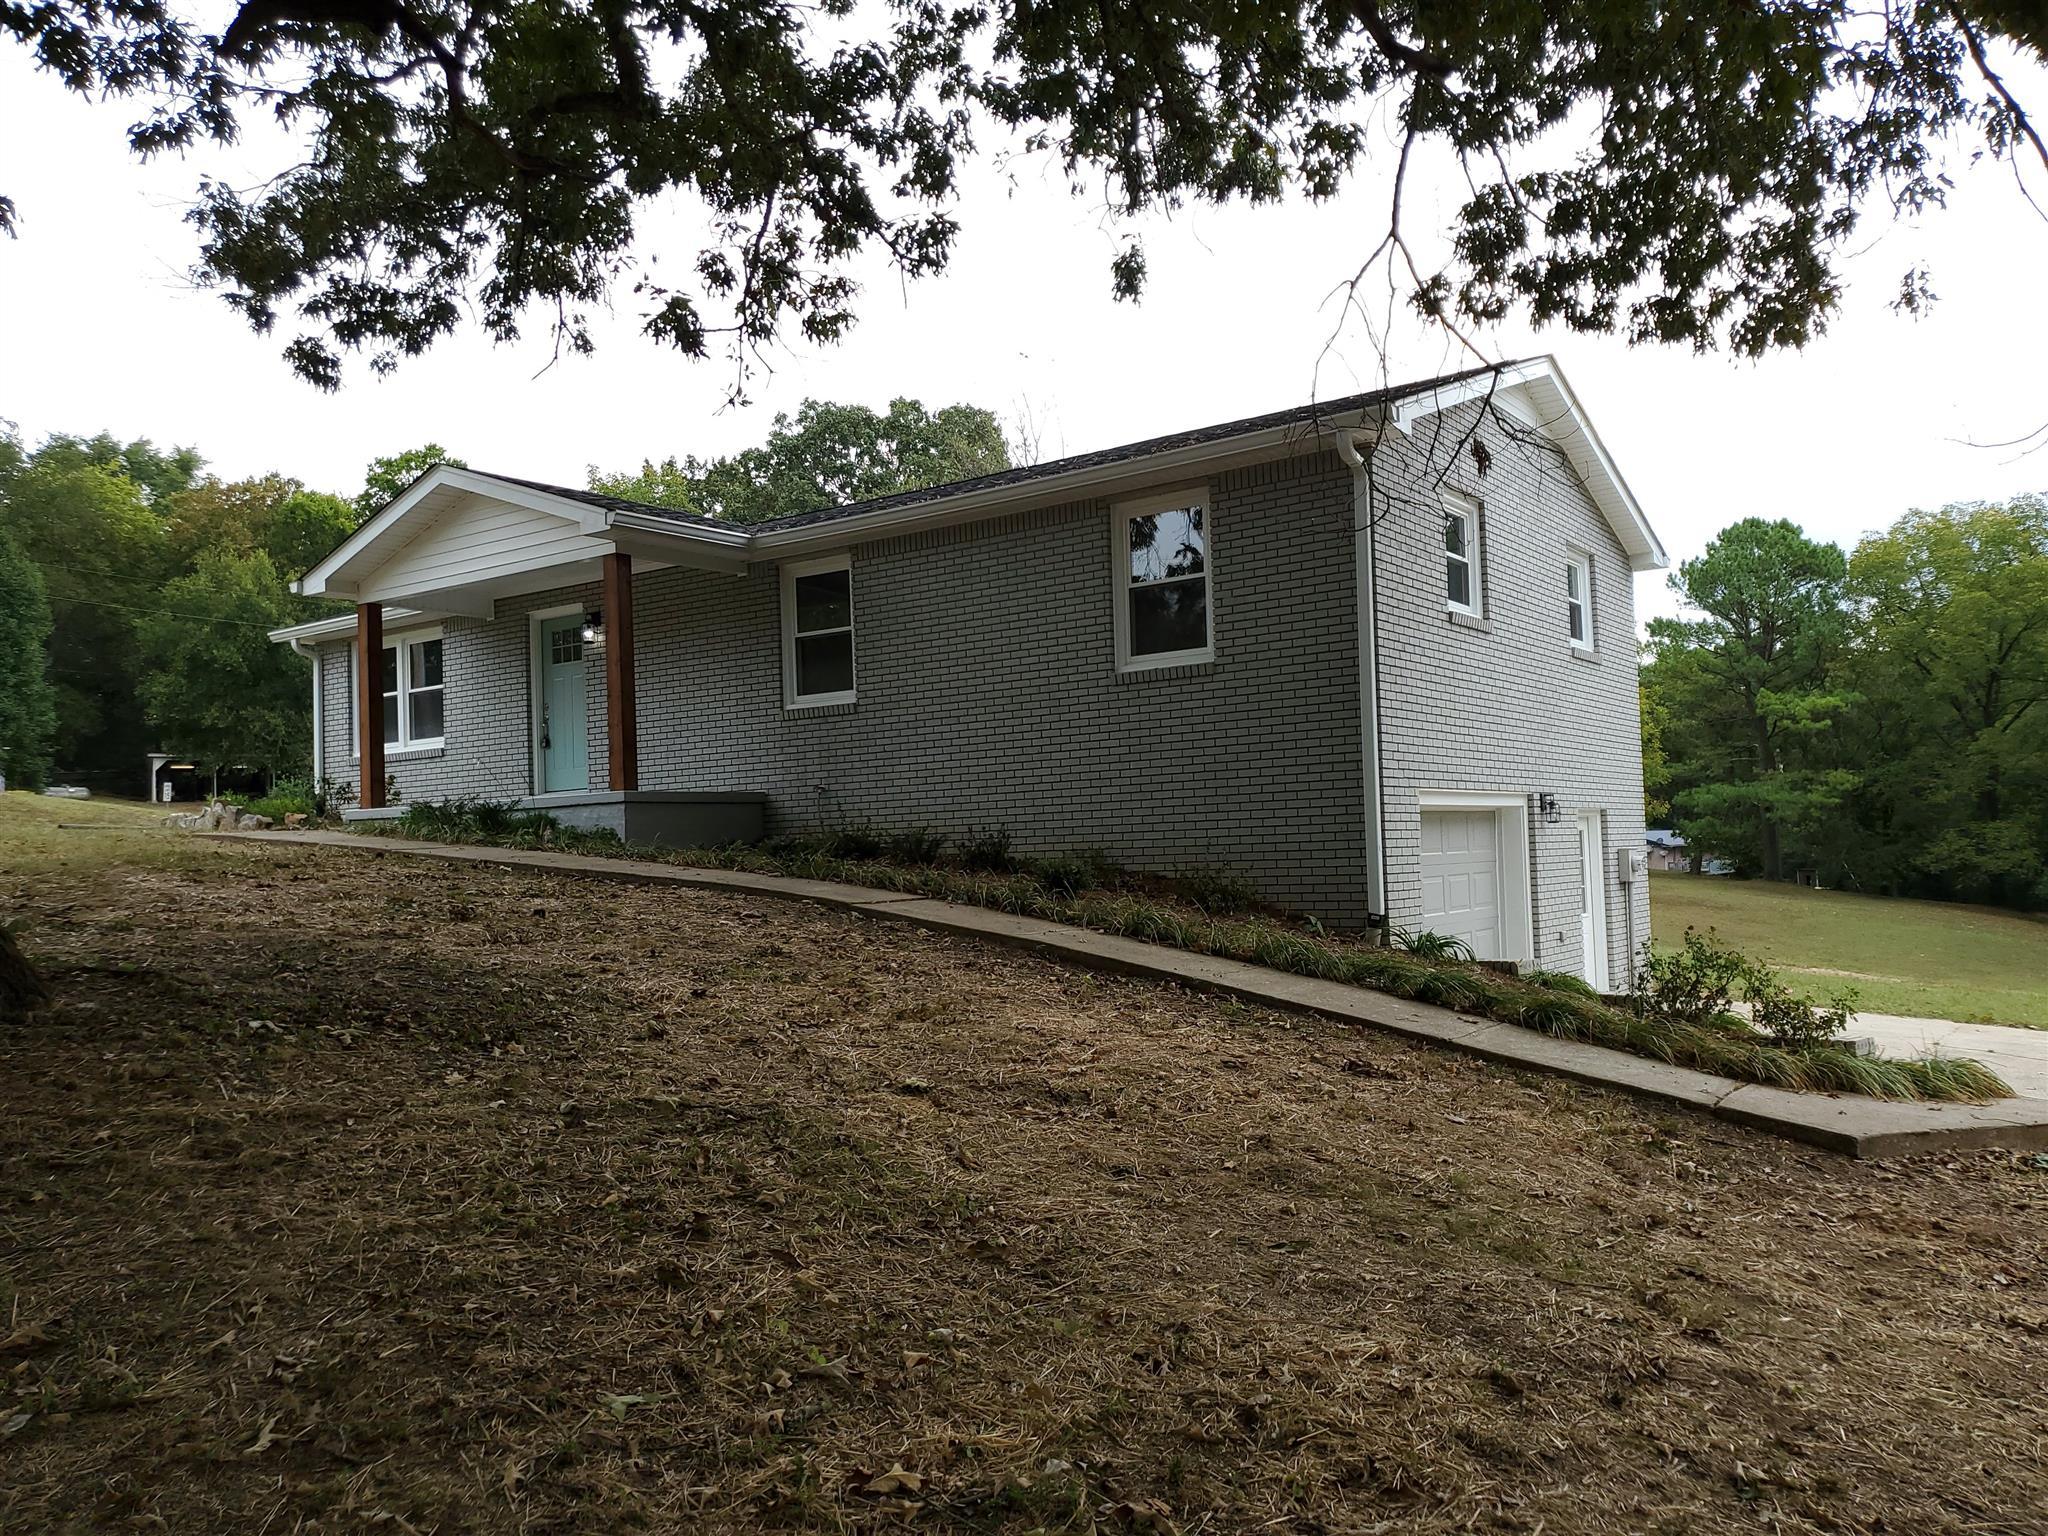 607 Main St, Cumberland City, TN 37050 - Cumberland City, TN real estate listing